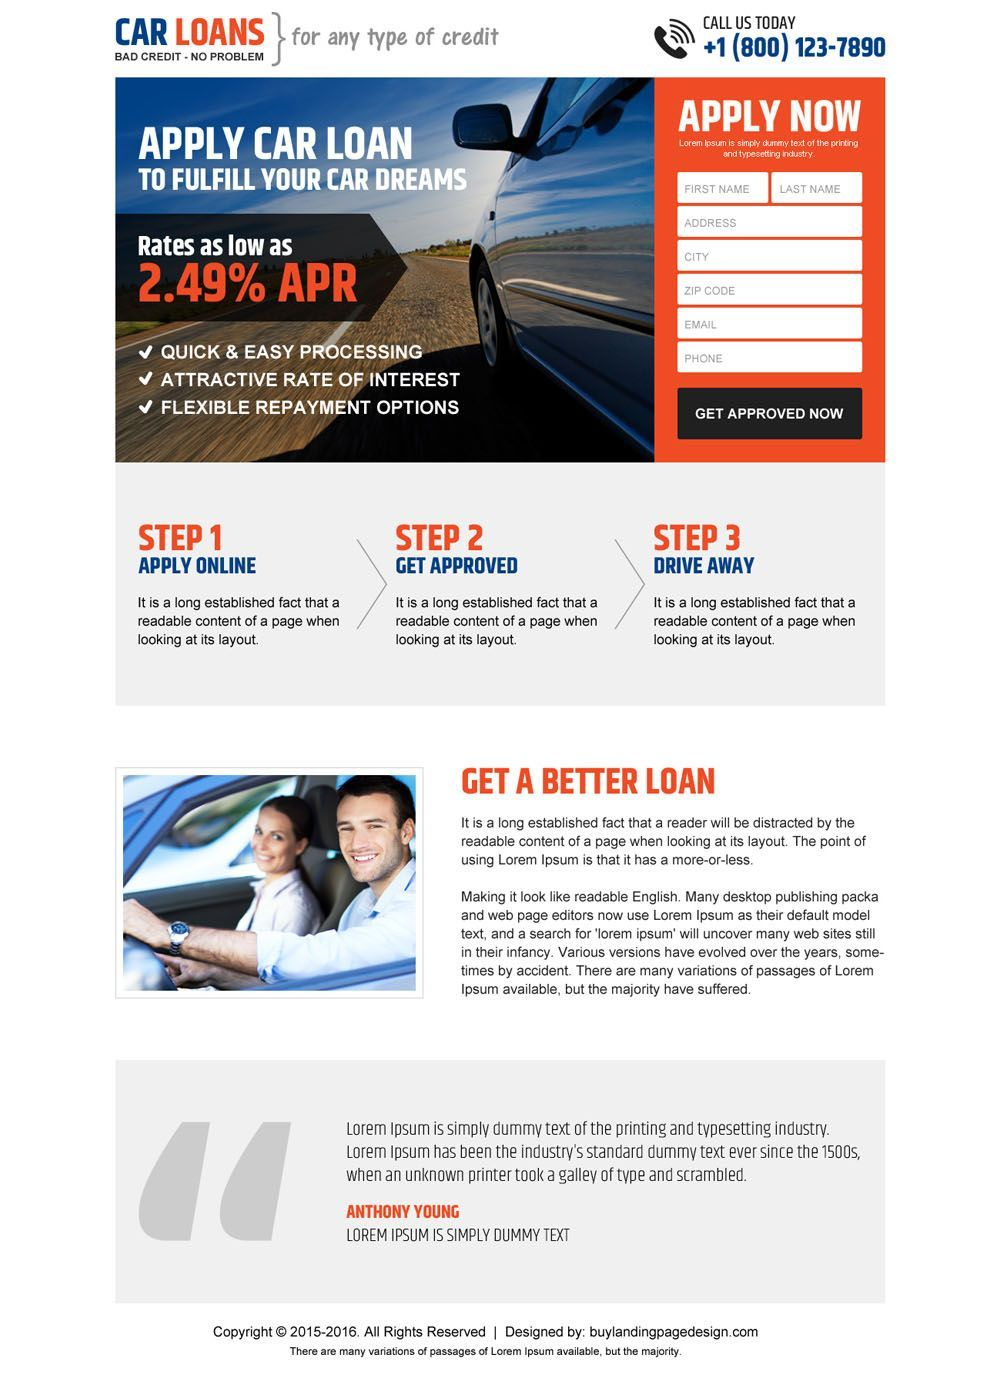 clean car loan responsive landing page design template